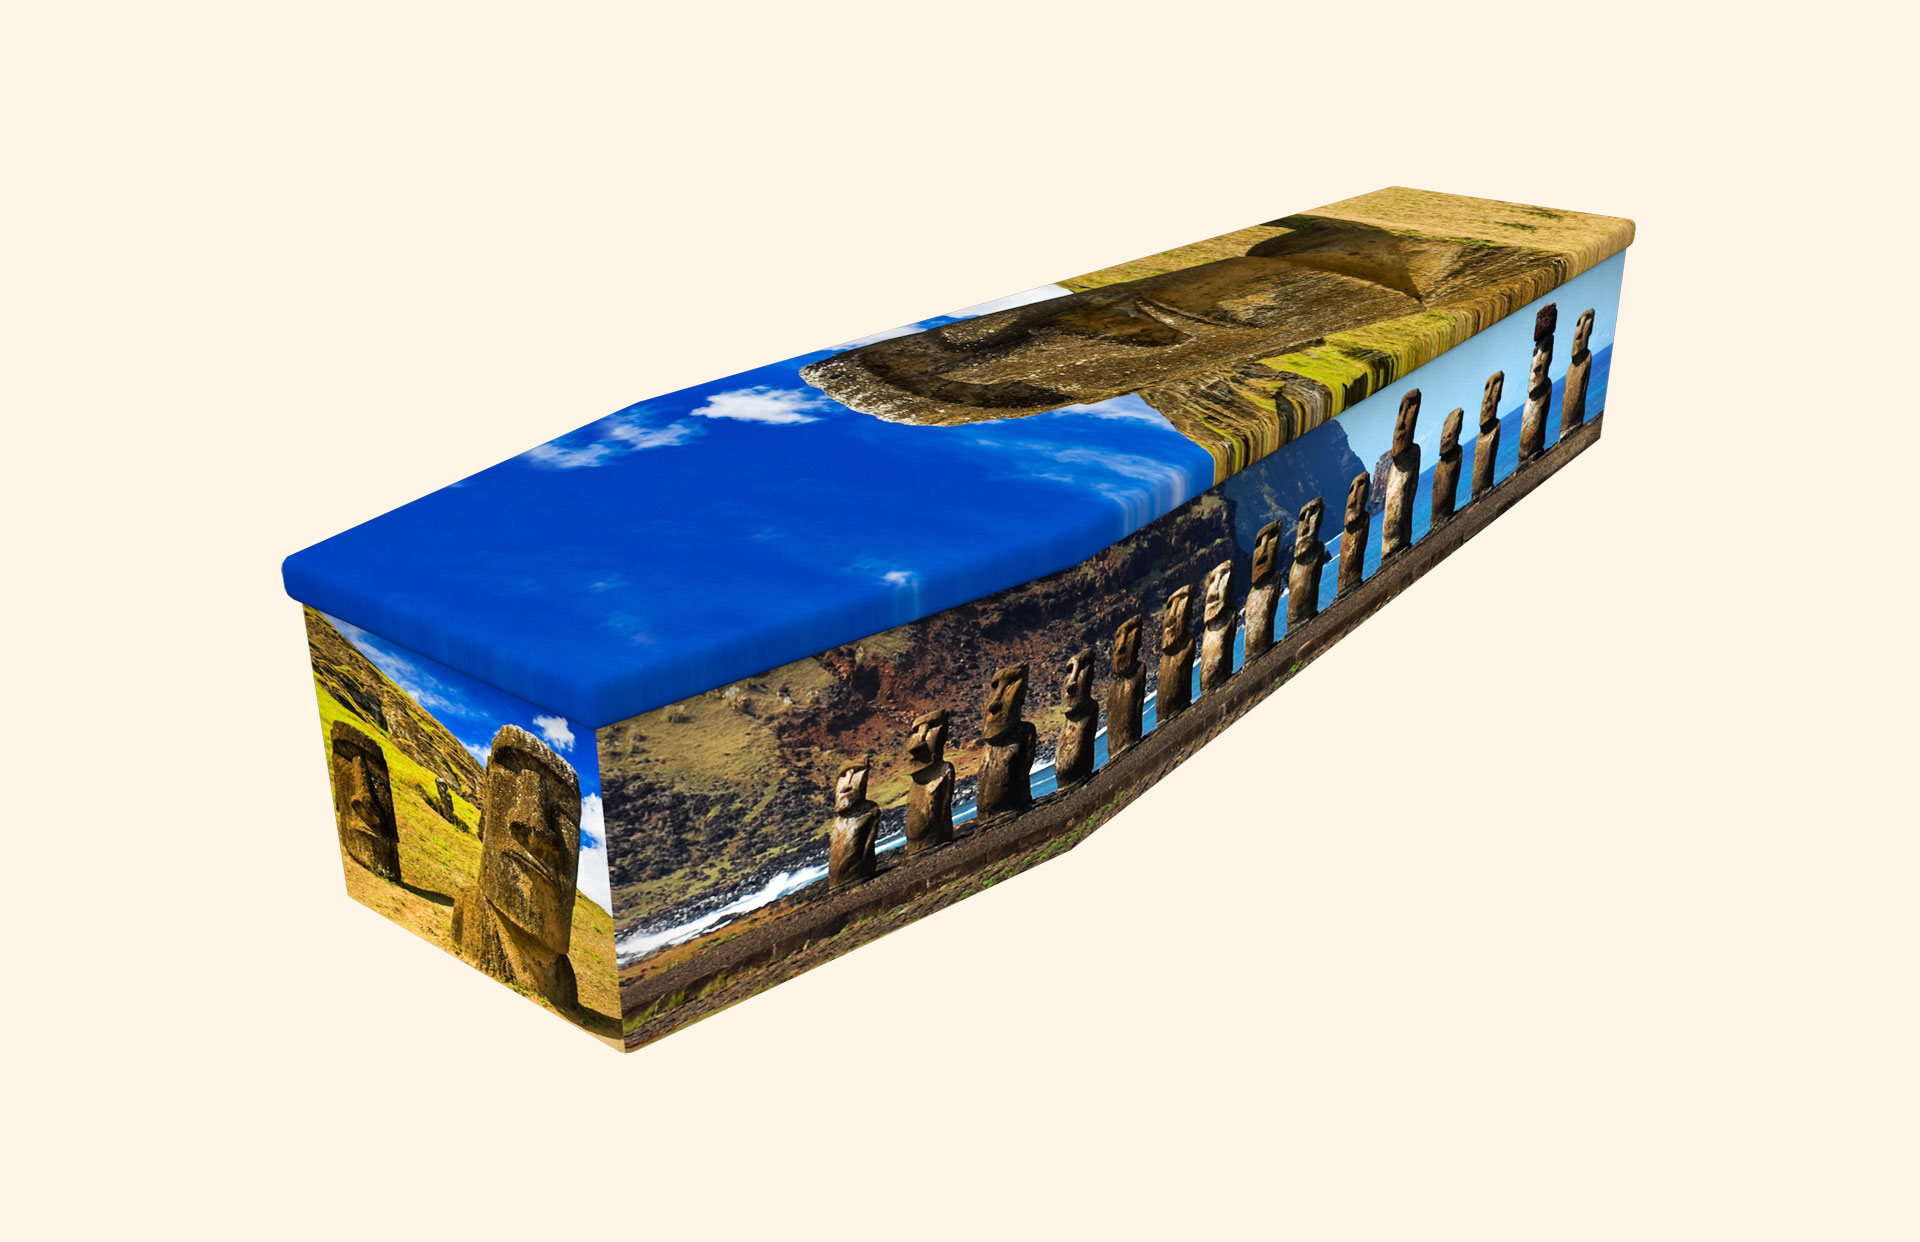 Moai Easter Island cardboard coffin